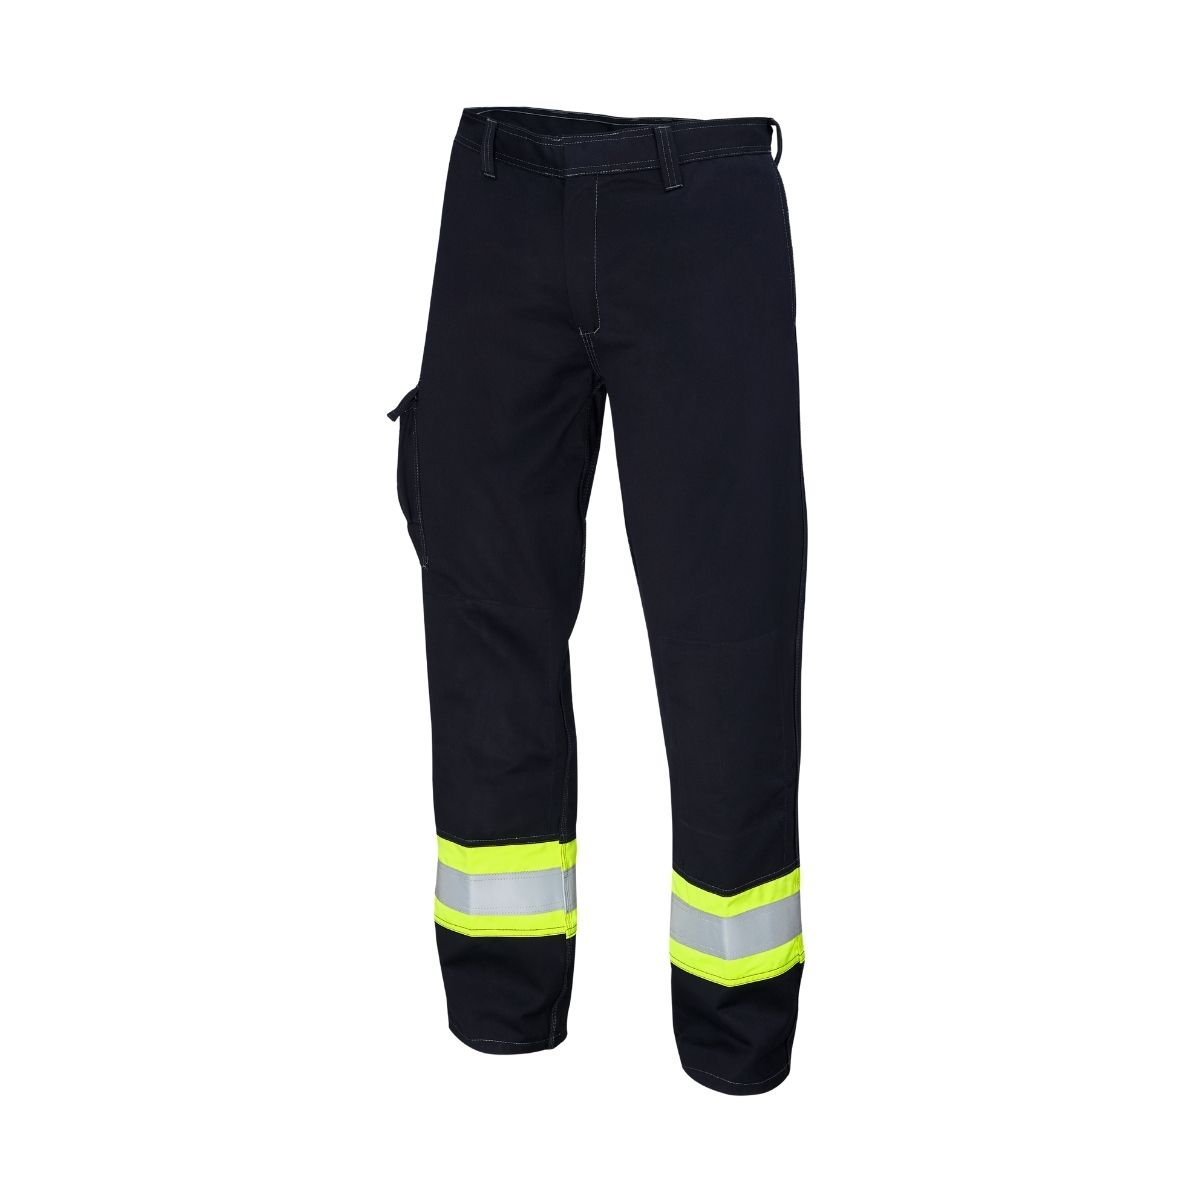 AS5816 ProGARM 5816 Trousers 300gsm Inherent AS FR Hi-Vis